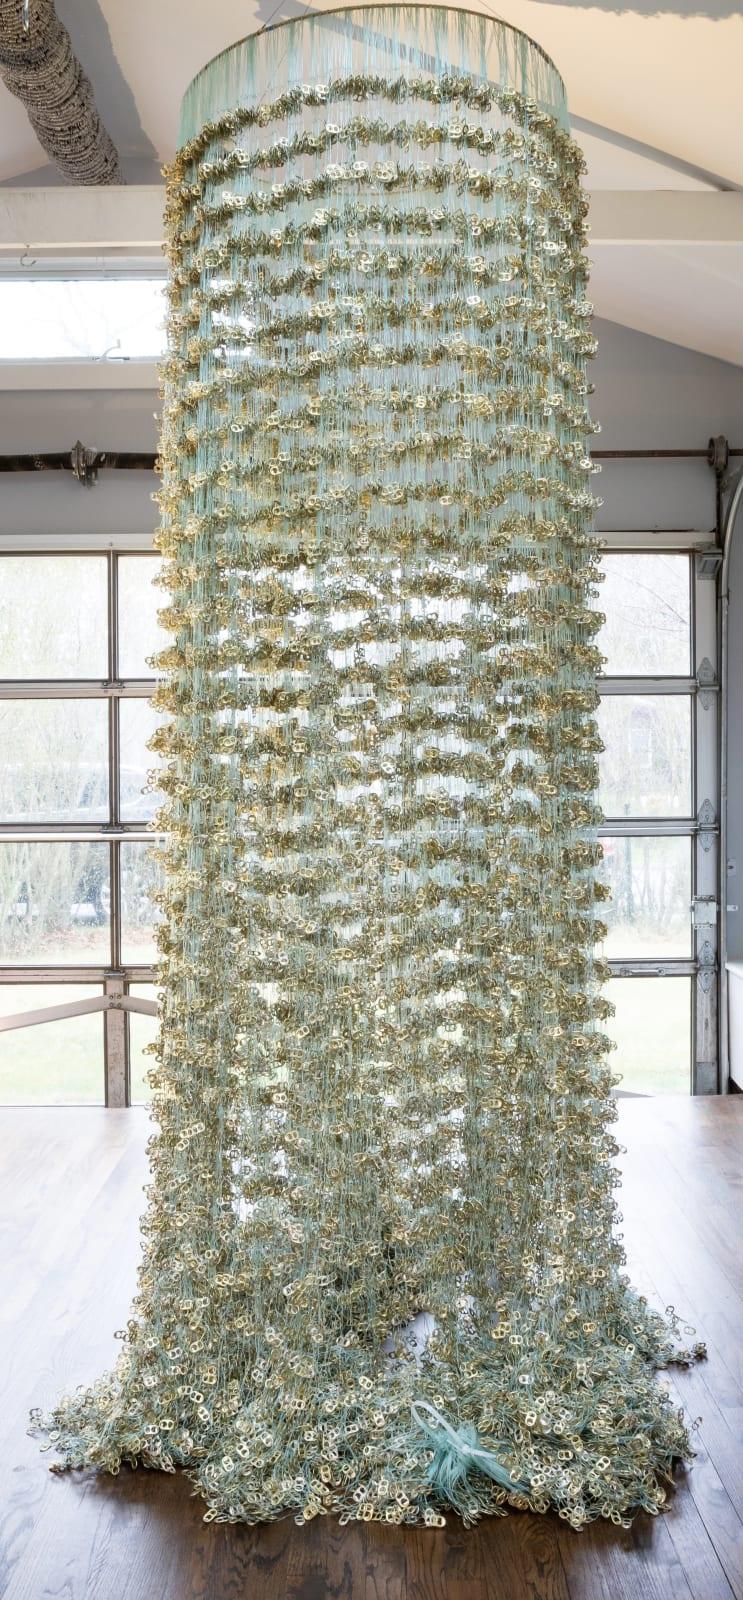 Alice Hope K Corona, 2021 Corona tabs on fishing net 36 x 108 in. (AHo 39) $27,000